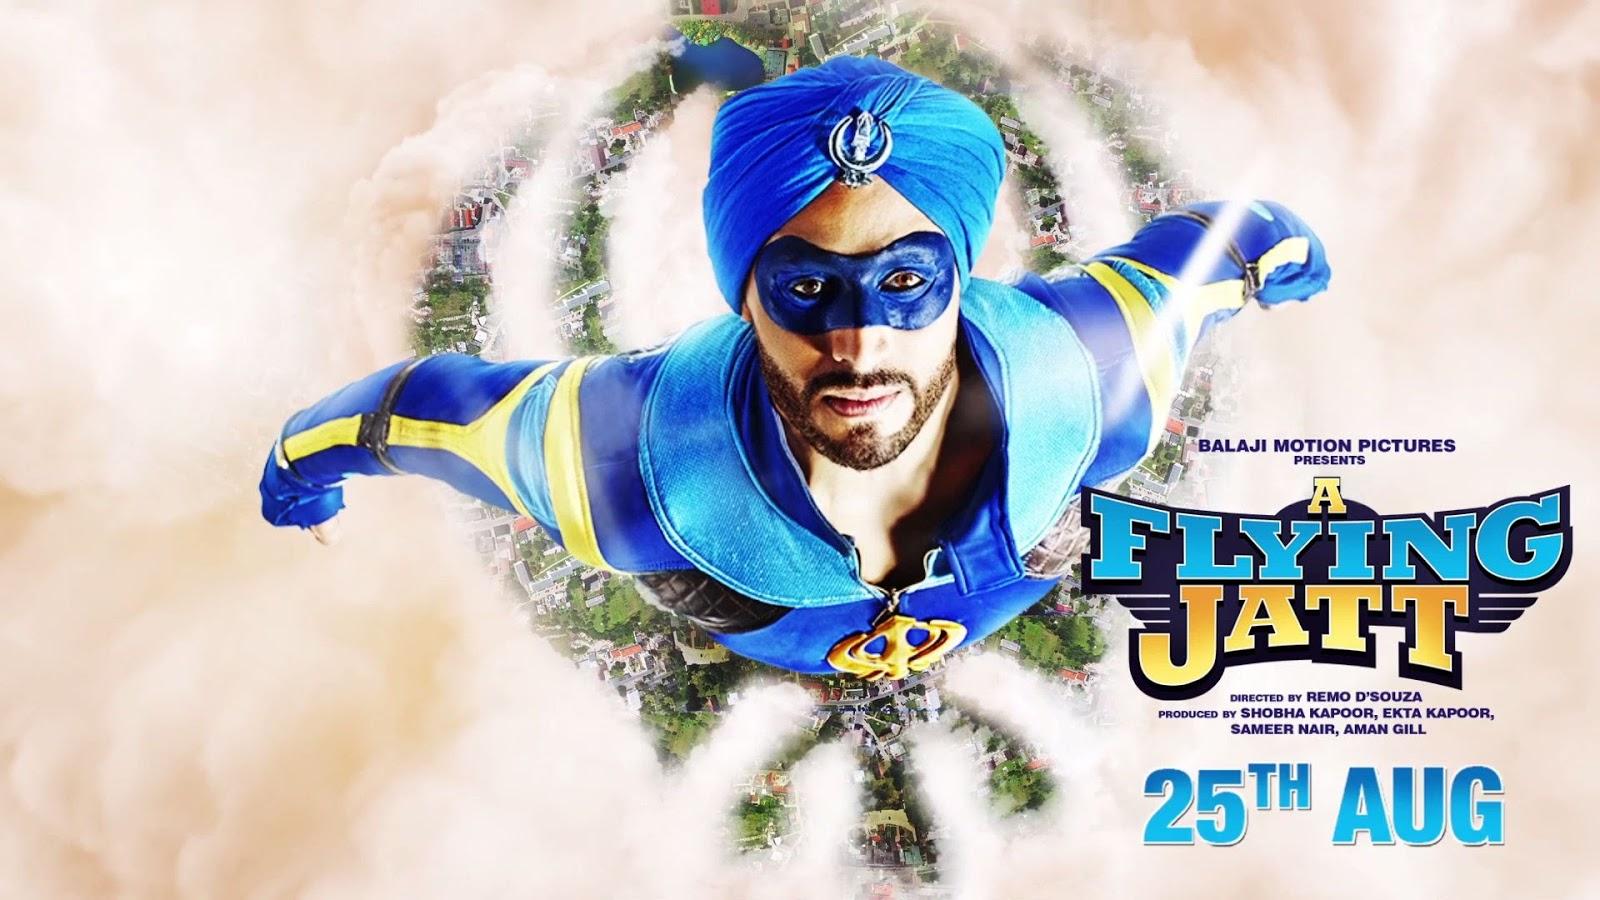 Wallpaper download jat - Bollywood New Upcoming Movies Flying Jatt Hd Wallpapers